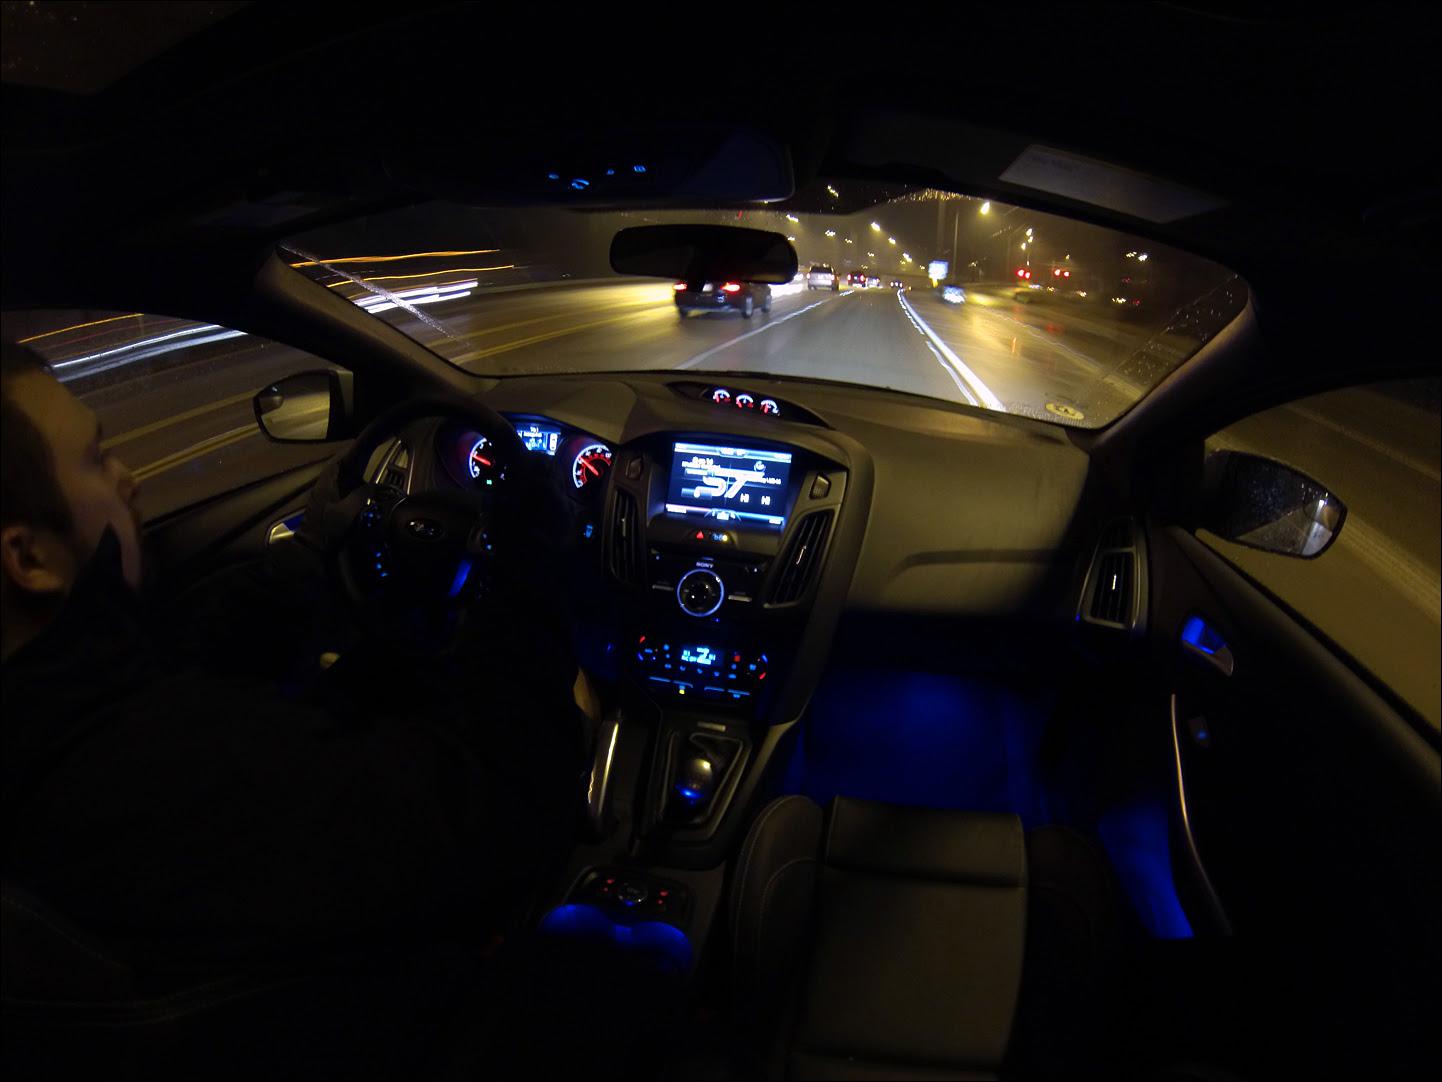 Ford Focus Interior Lights Wont Turn On